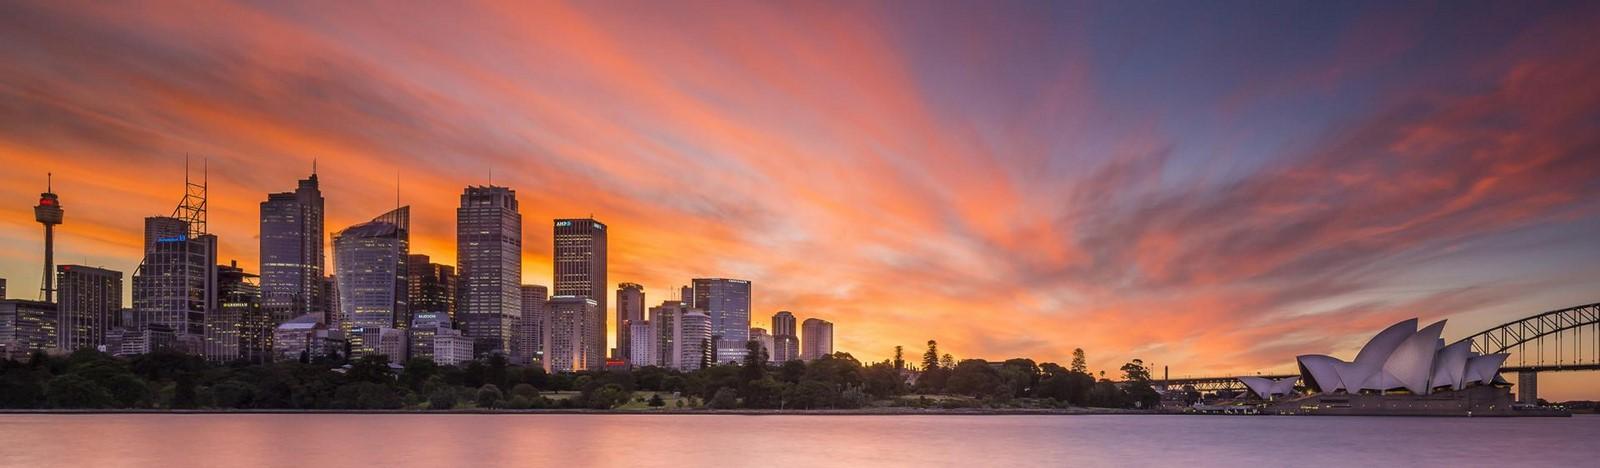 Architecture of Cities: Sydney: Australia's oldest city Sheet1